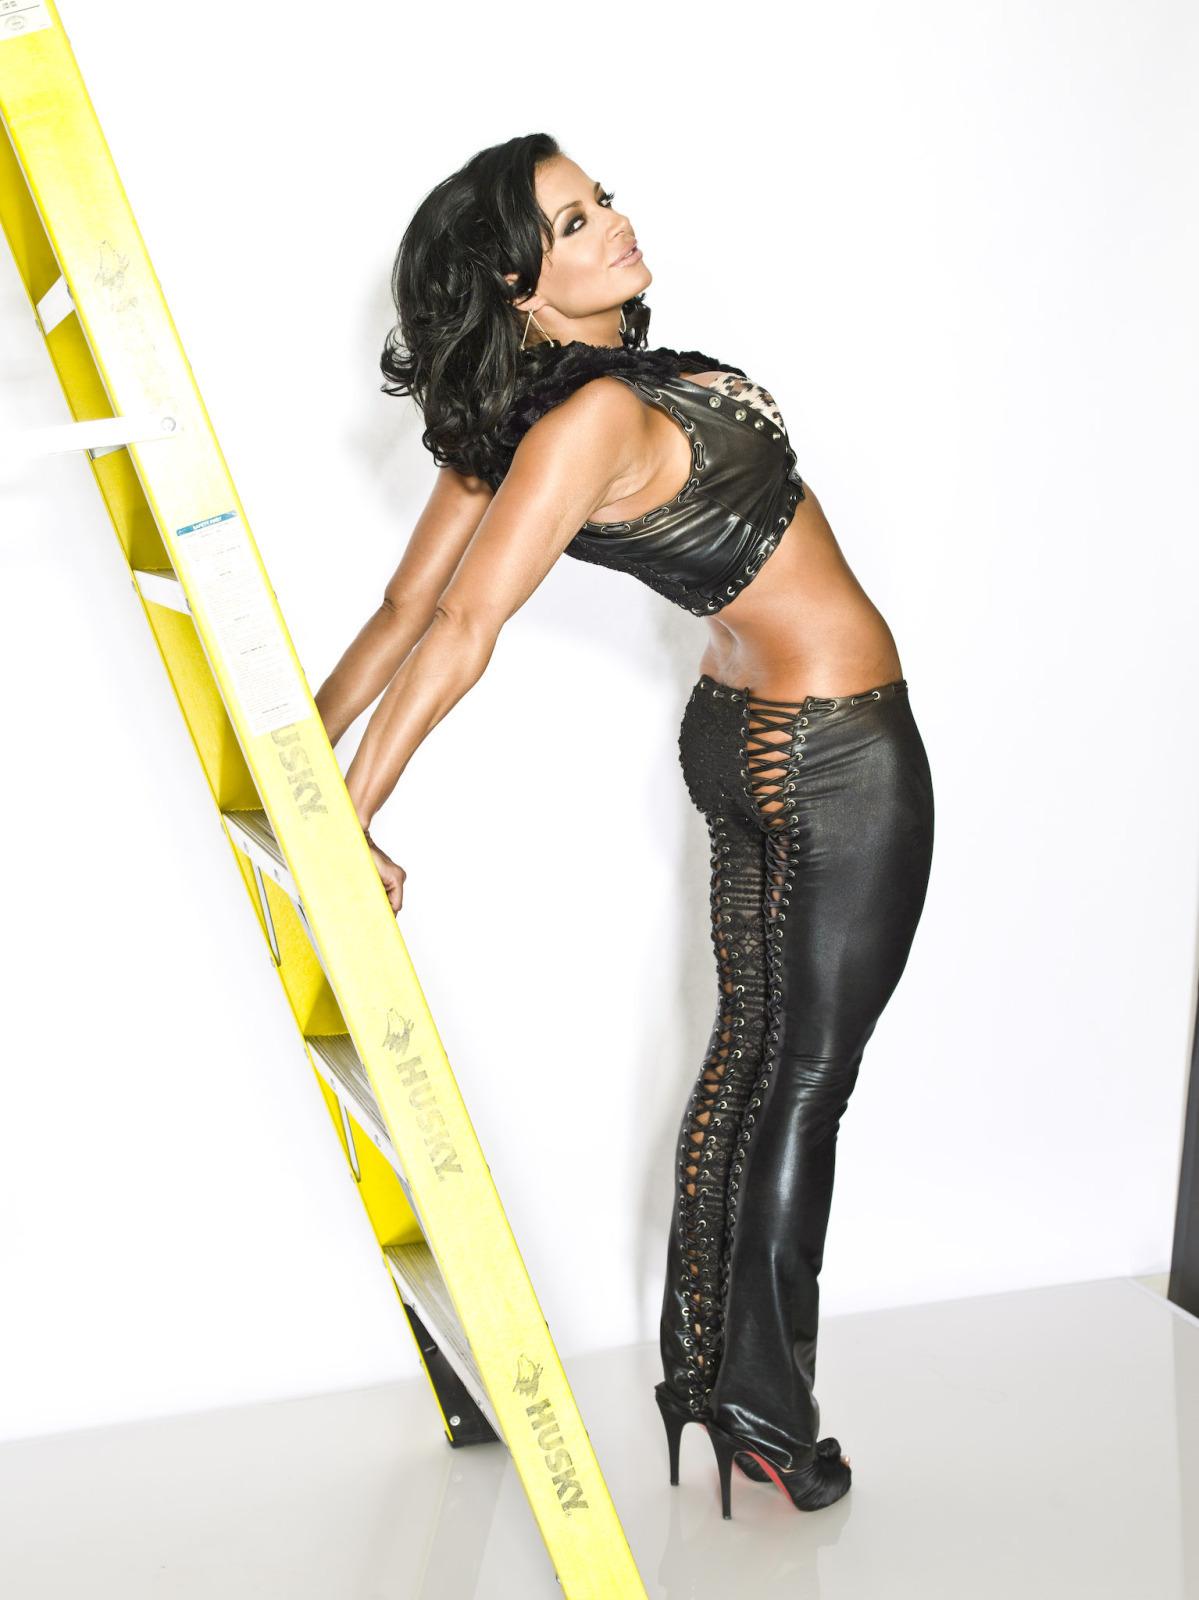 Candice michelle wwe divas photo 11011042 fanpop - Diva my body your body ...